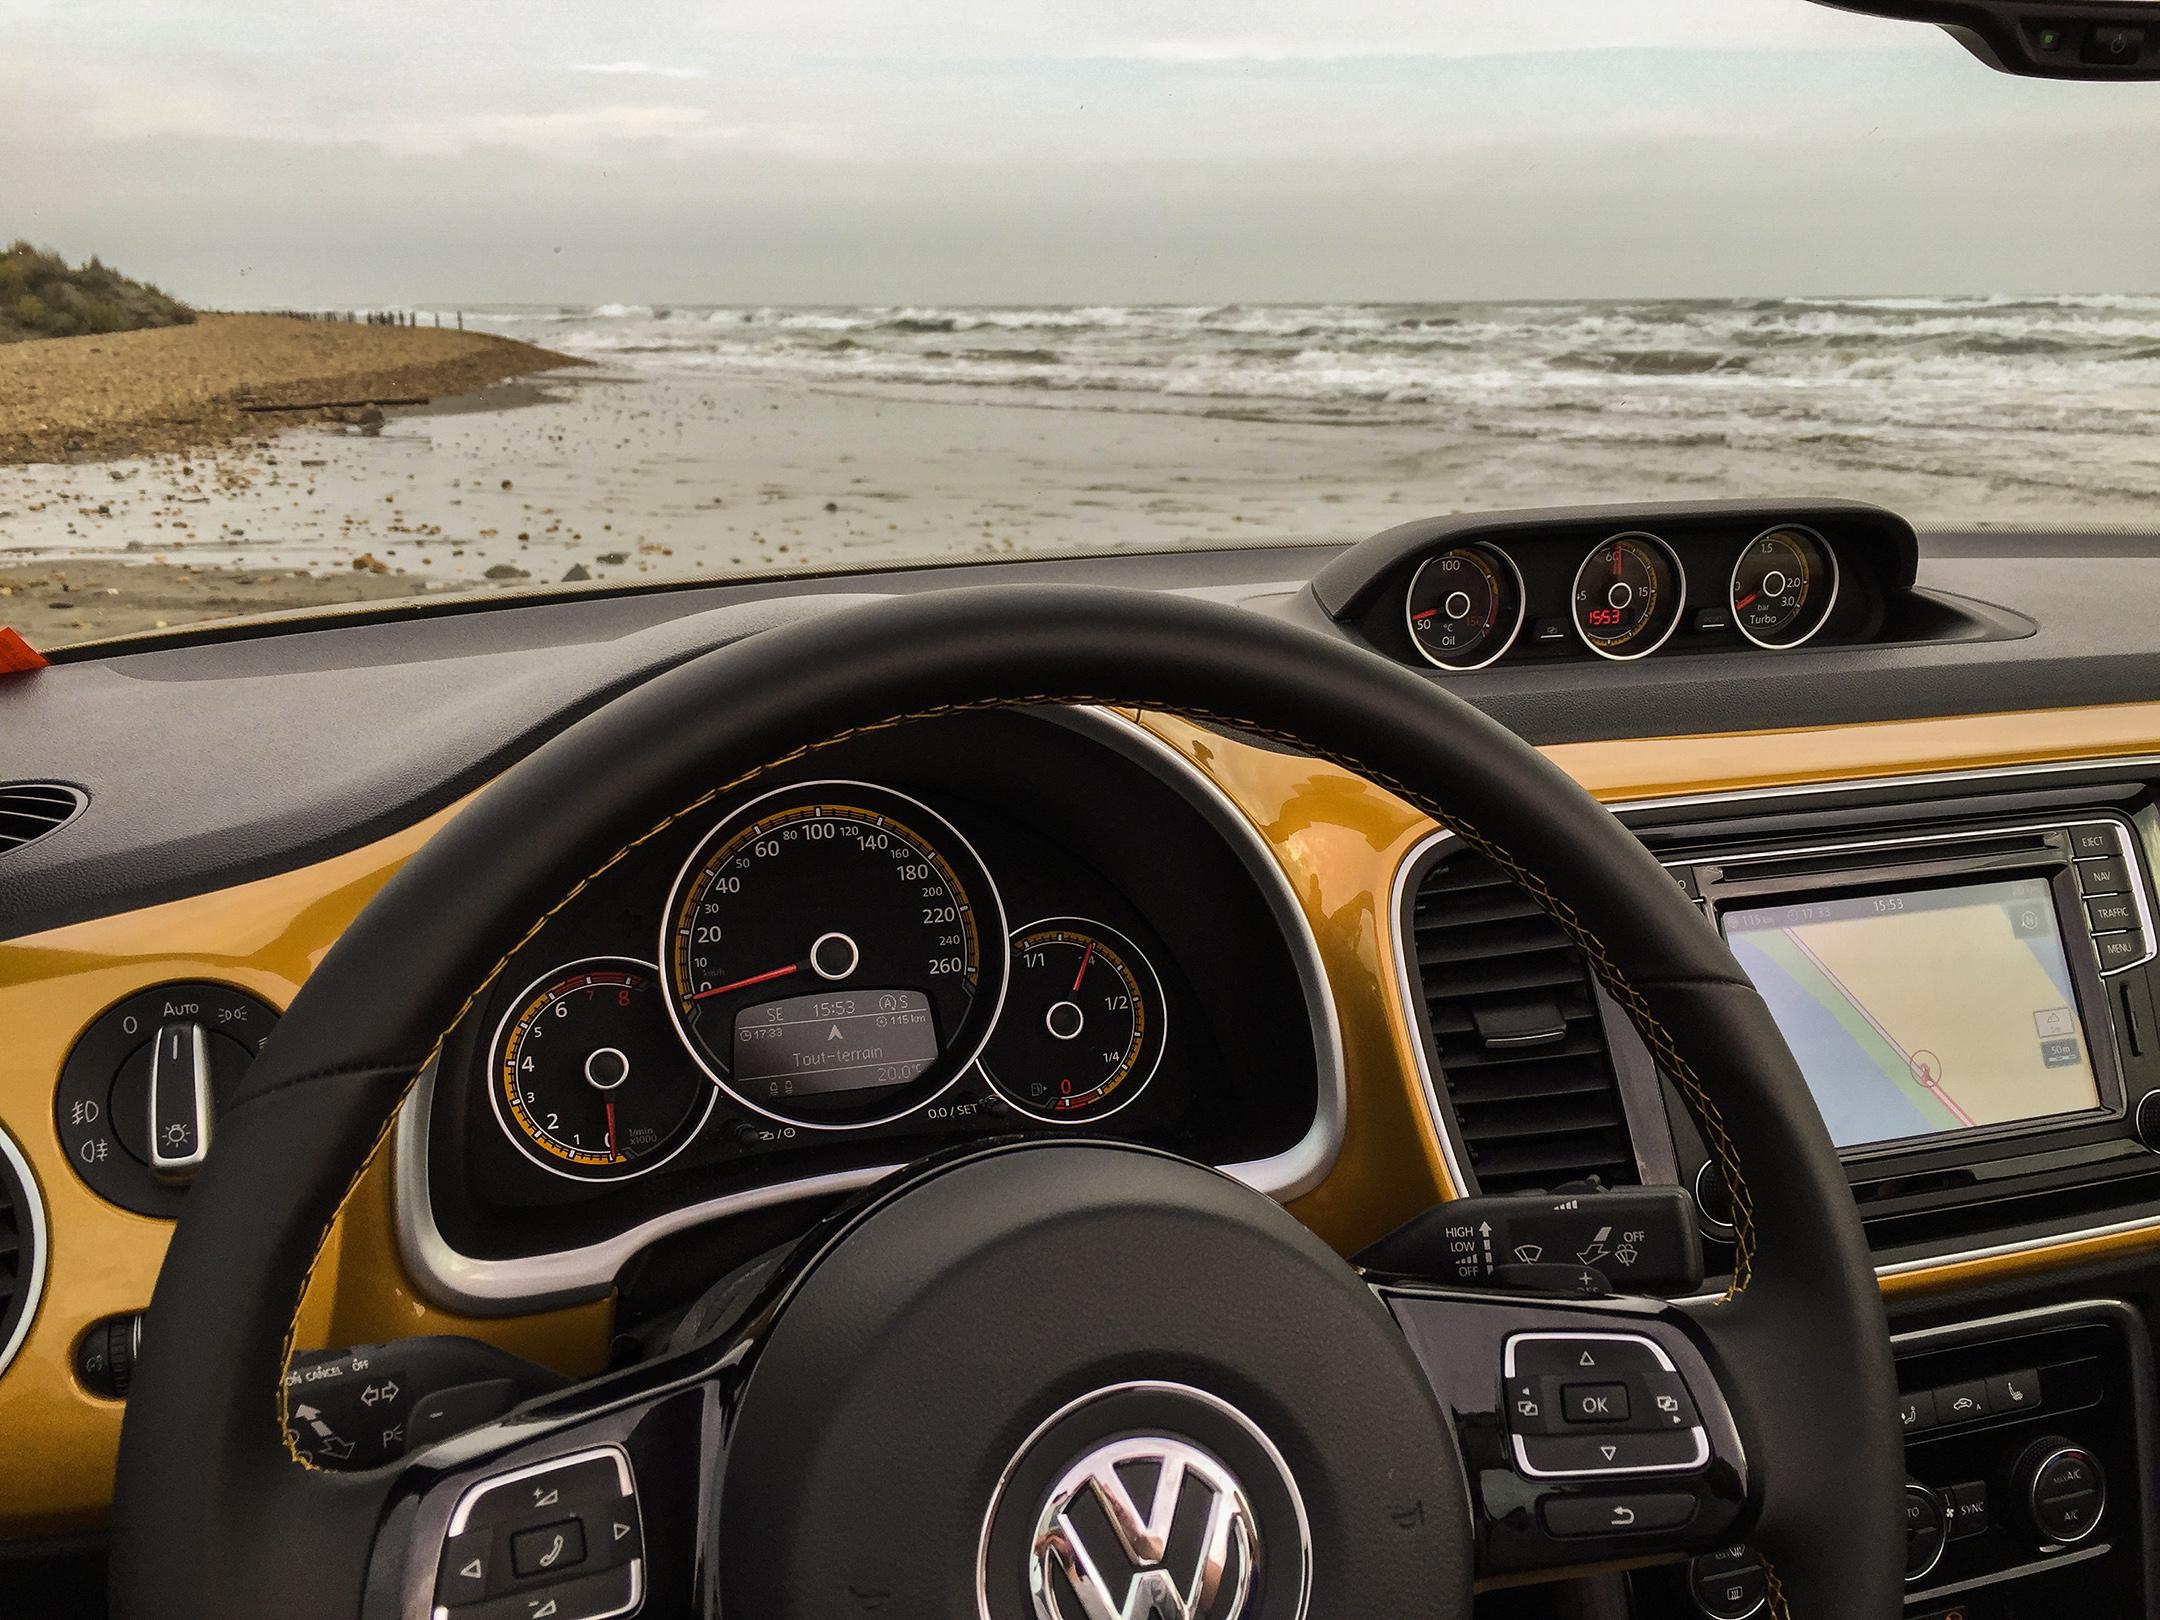 vwcox38-volkswagen-coccinelle-dune-cabriolet-interieur-arnaud-demasier-rsphotographie